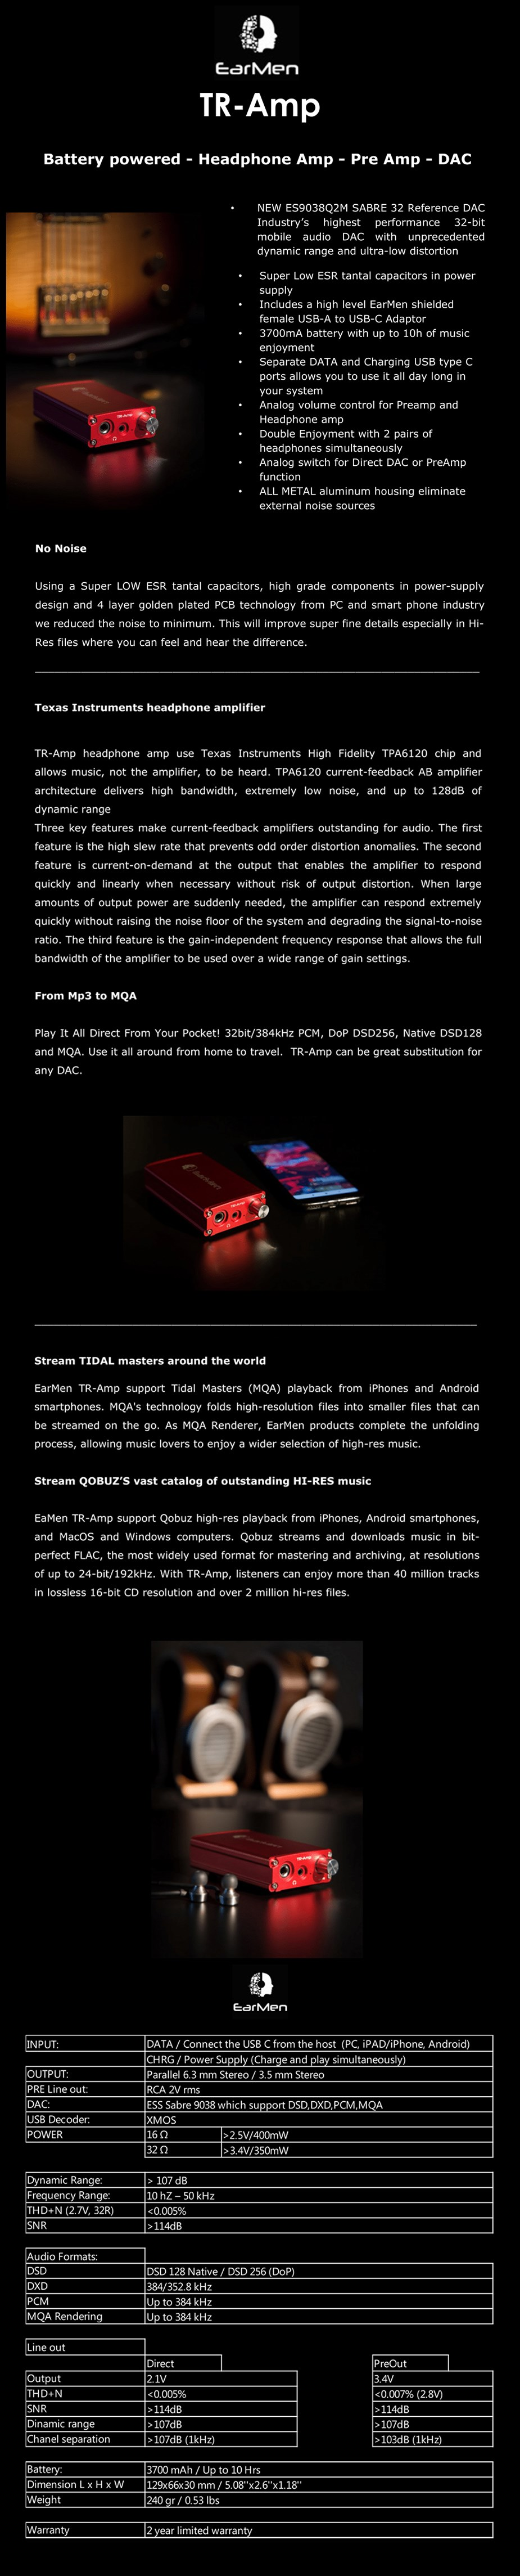 EarMen TR-Amp Preamp Headphone AMP - Battery-Powered USB DAC - Overview 1